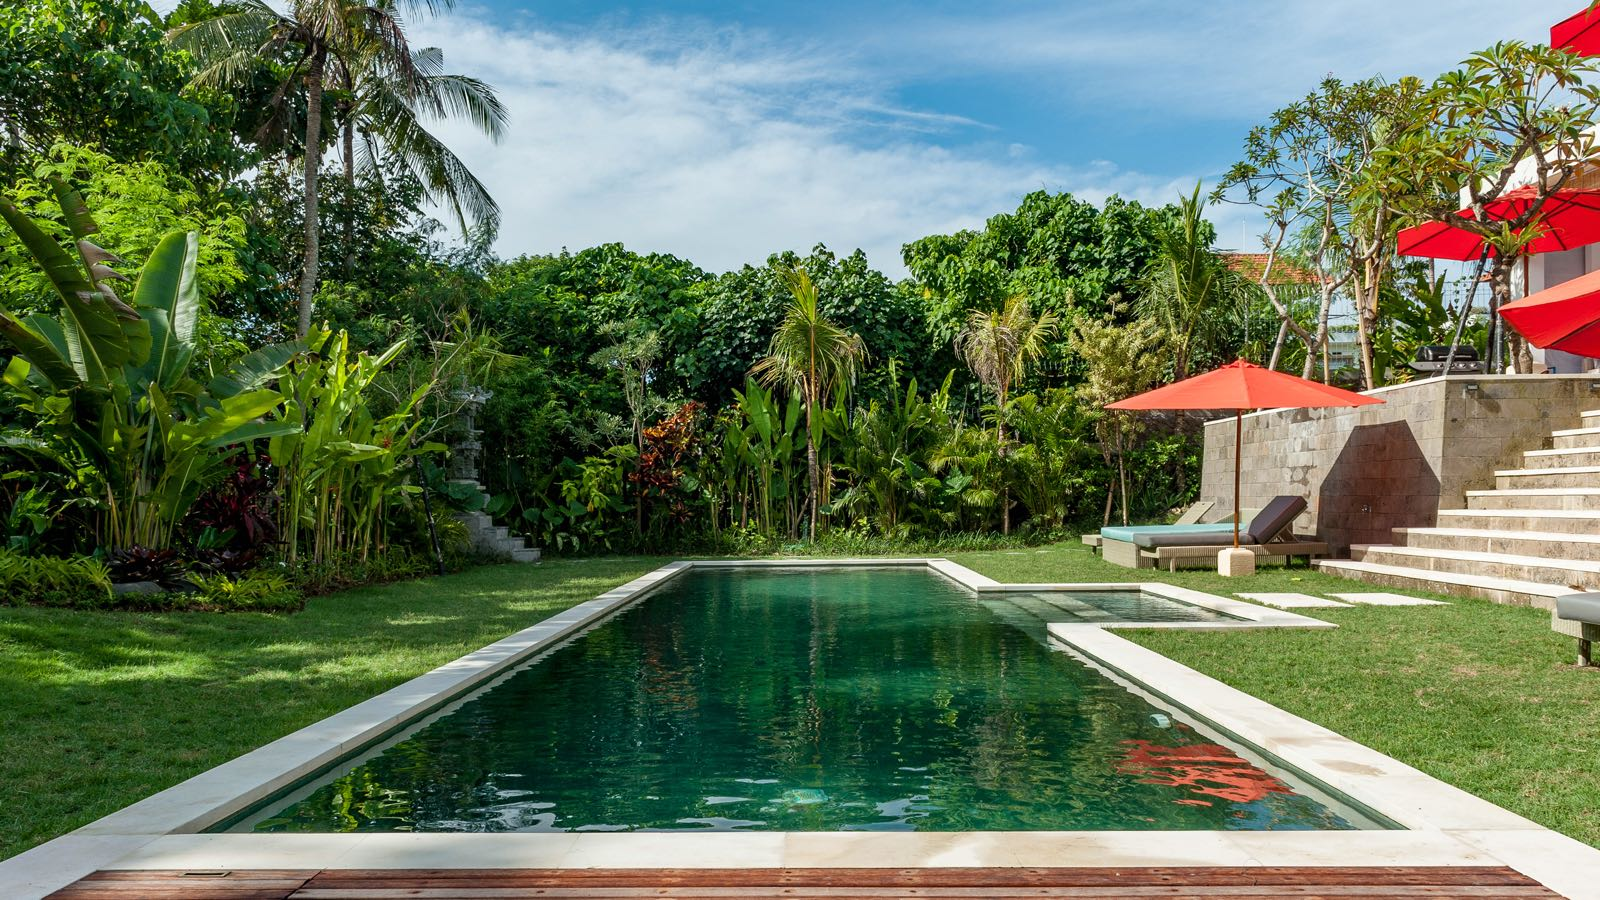 back to Balance Bali 2018 Healthylifebalance